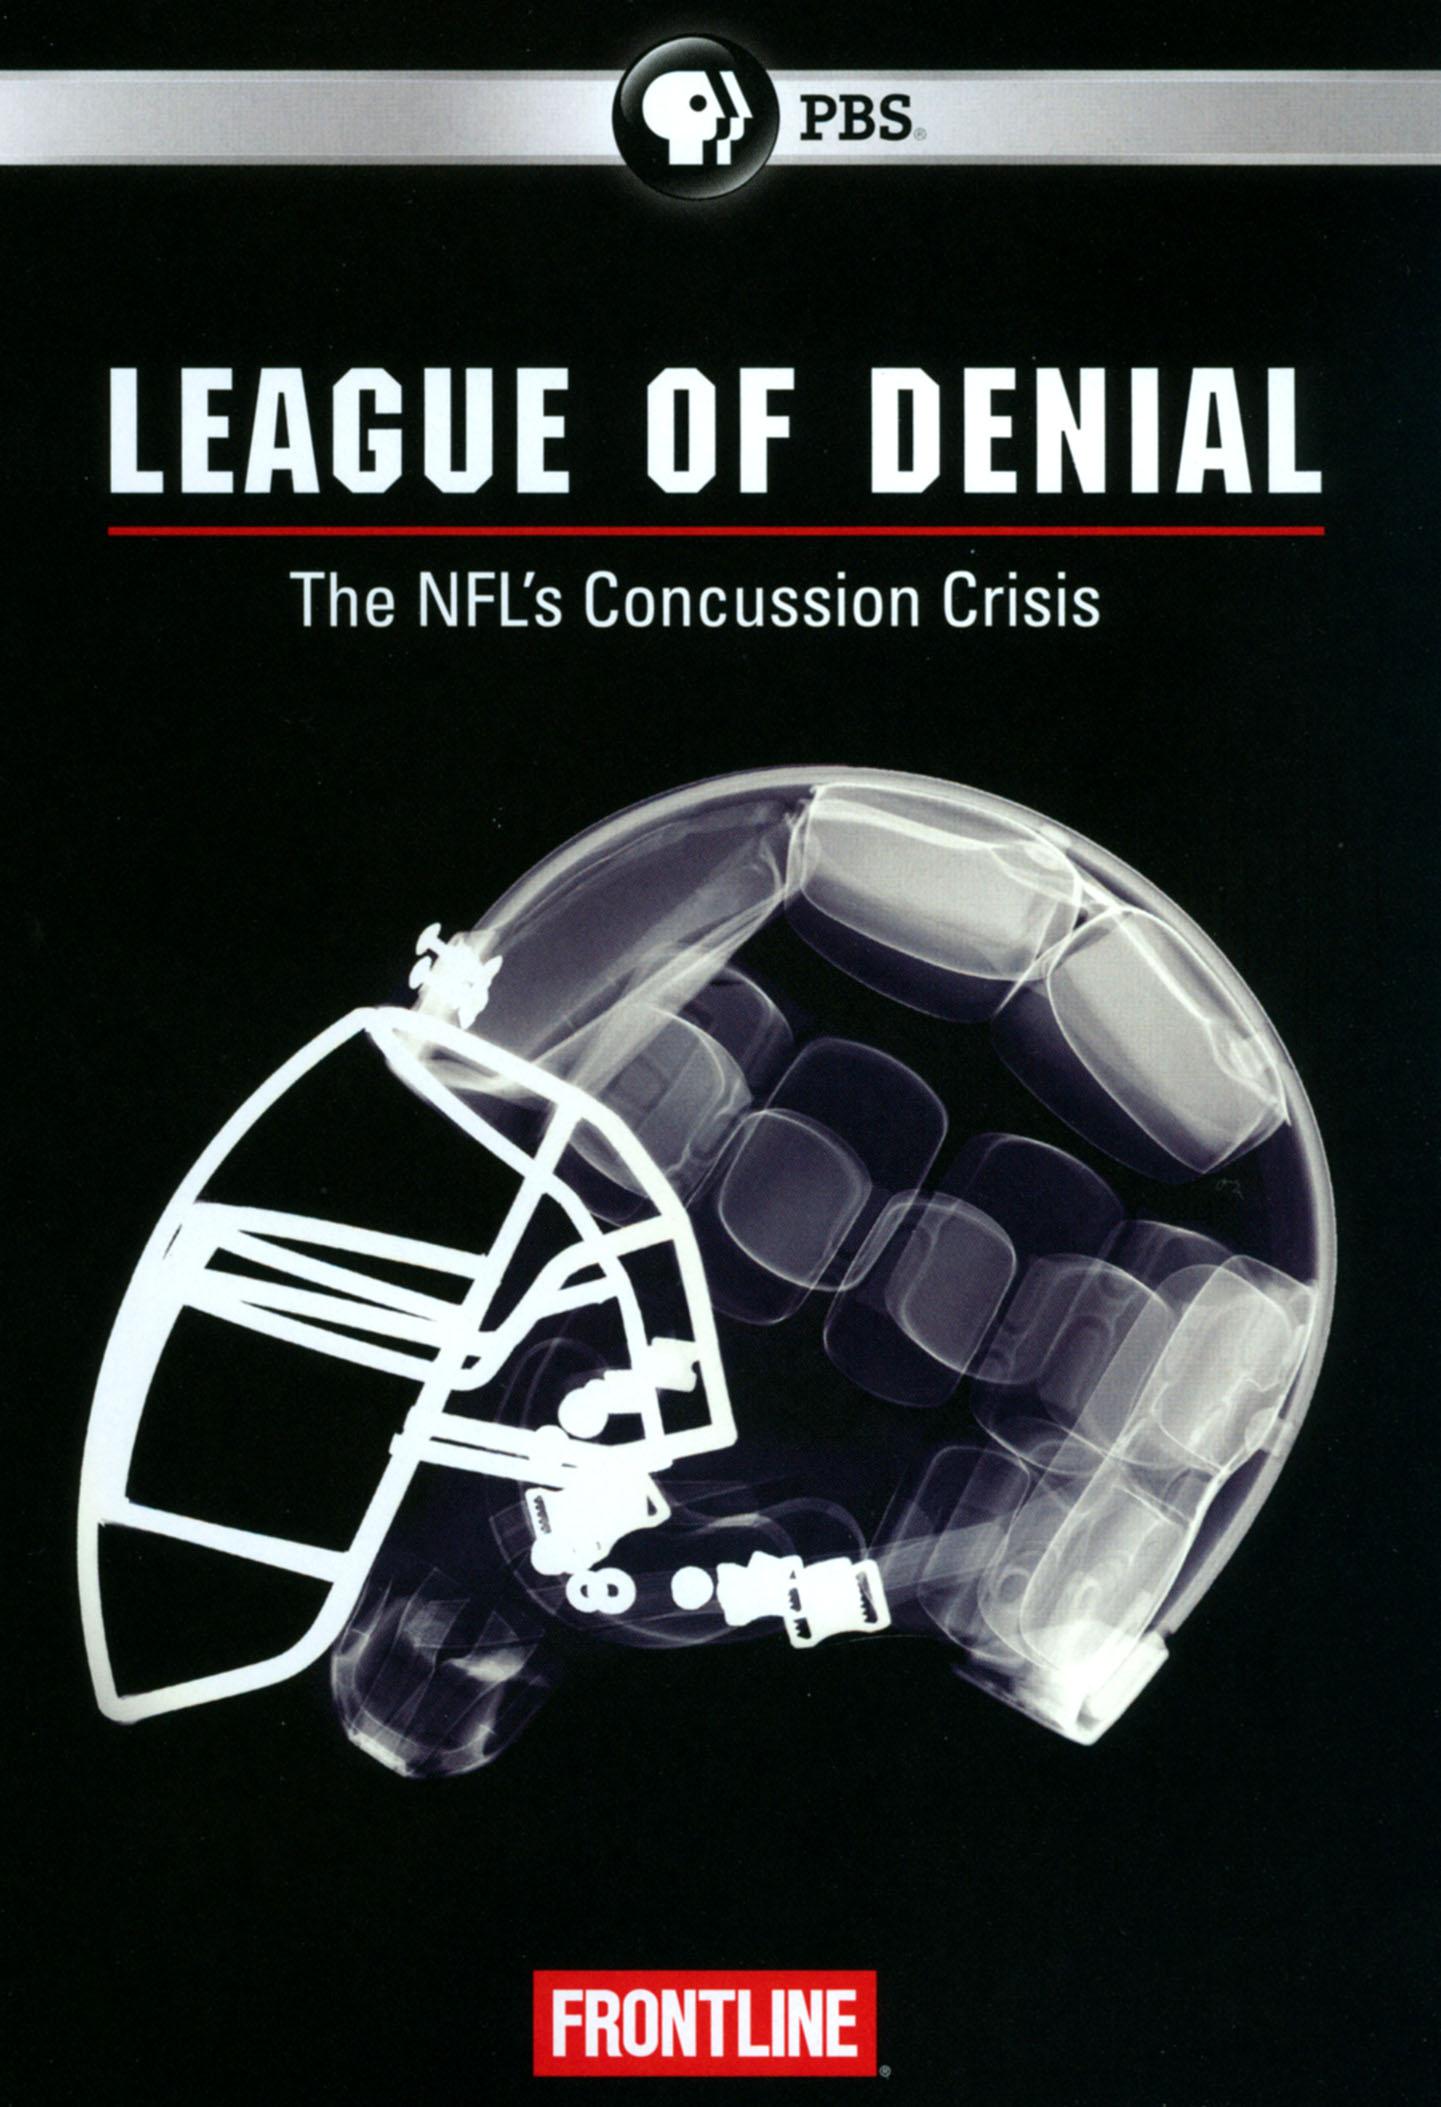 Frontline: League of Denial - The NFL's Concussion Crisis